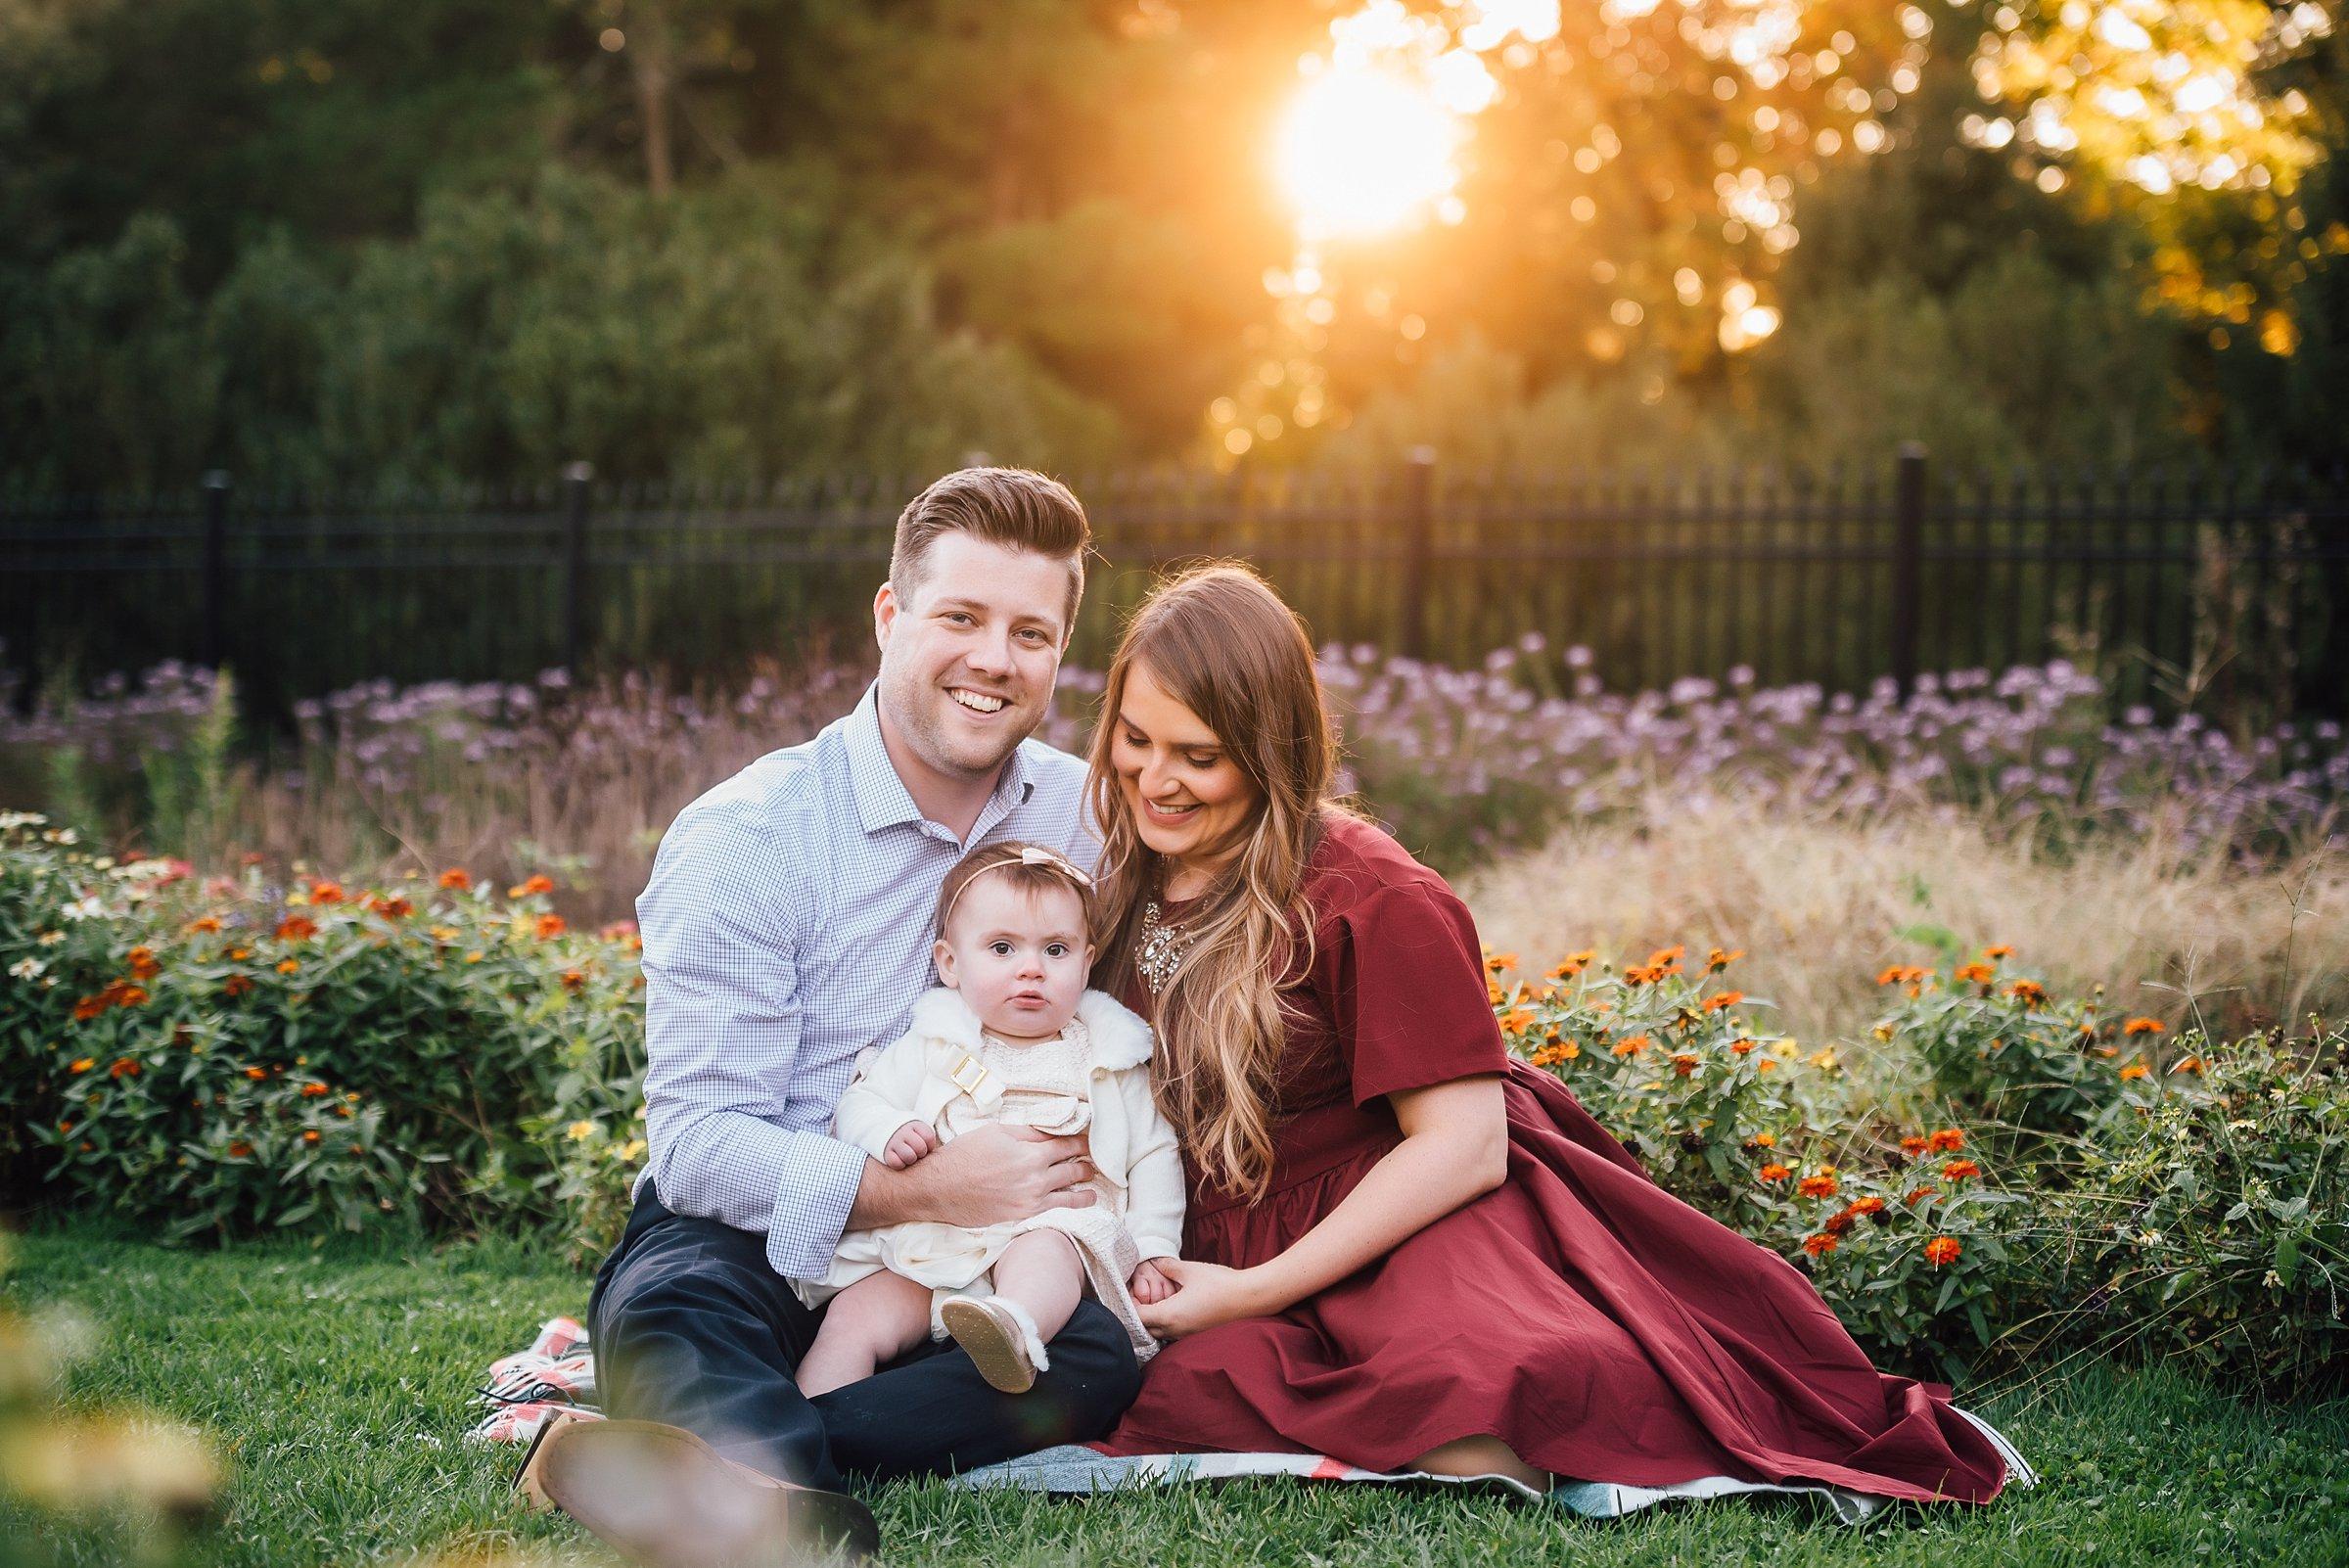 Family Photography Hartwood Acres Mansion Pittsburgh Rachel Rossetti_0315.jpg